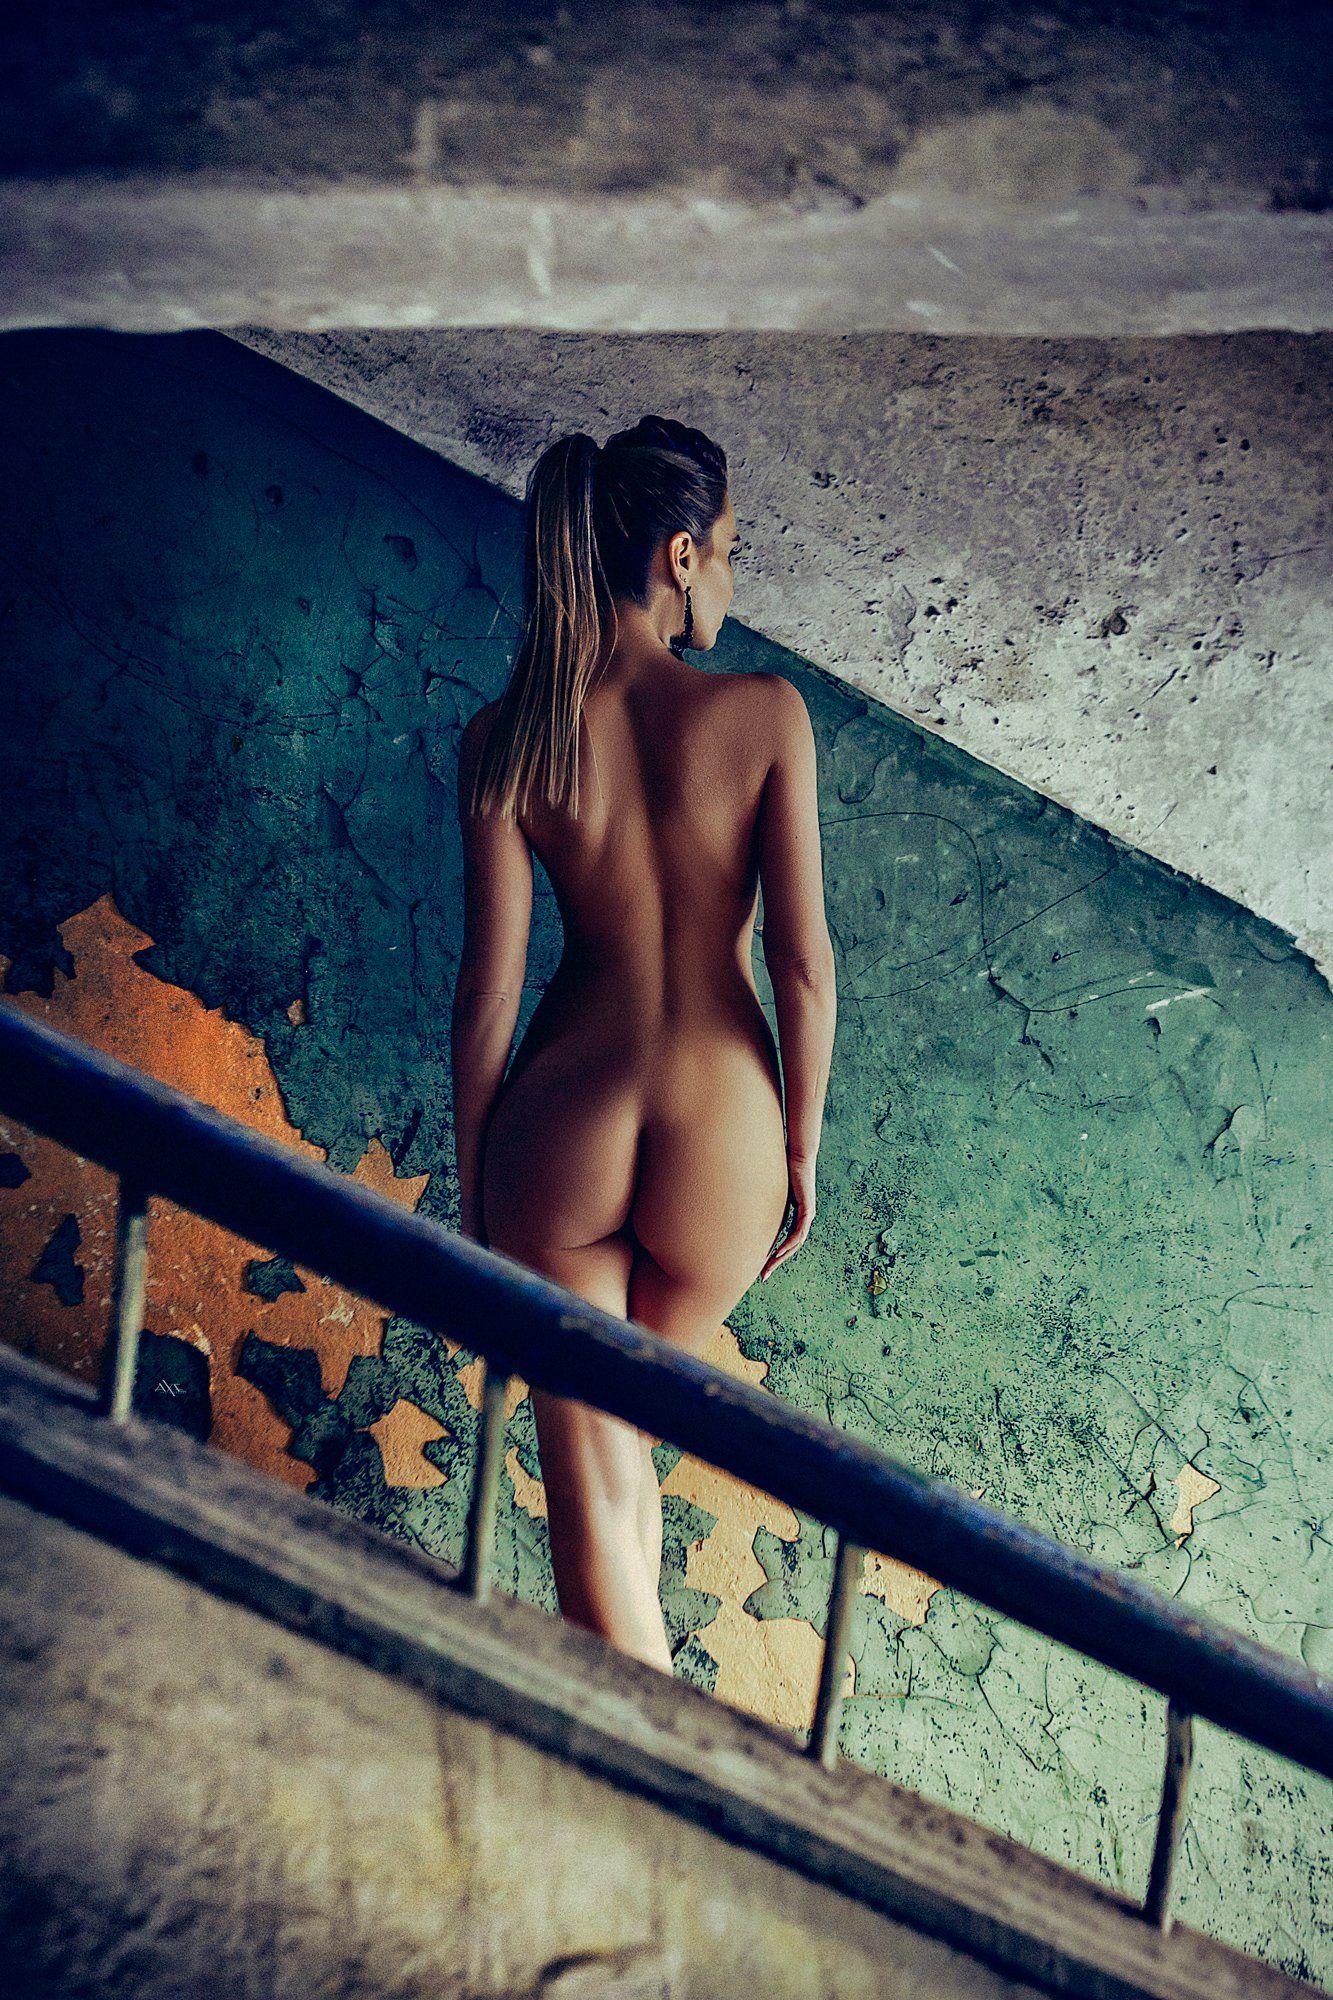 nude, woman, art, beauty, concept, natural light, abandoned, Руслан Болгов (Axe)